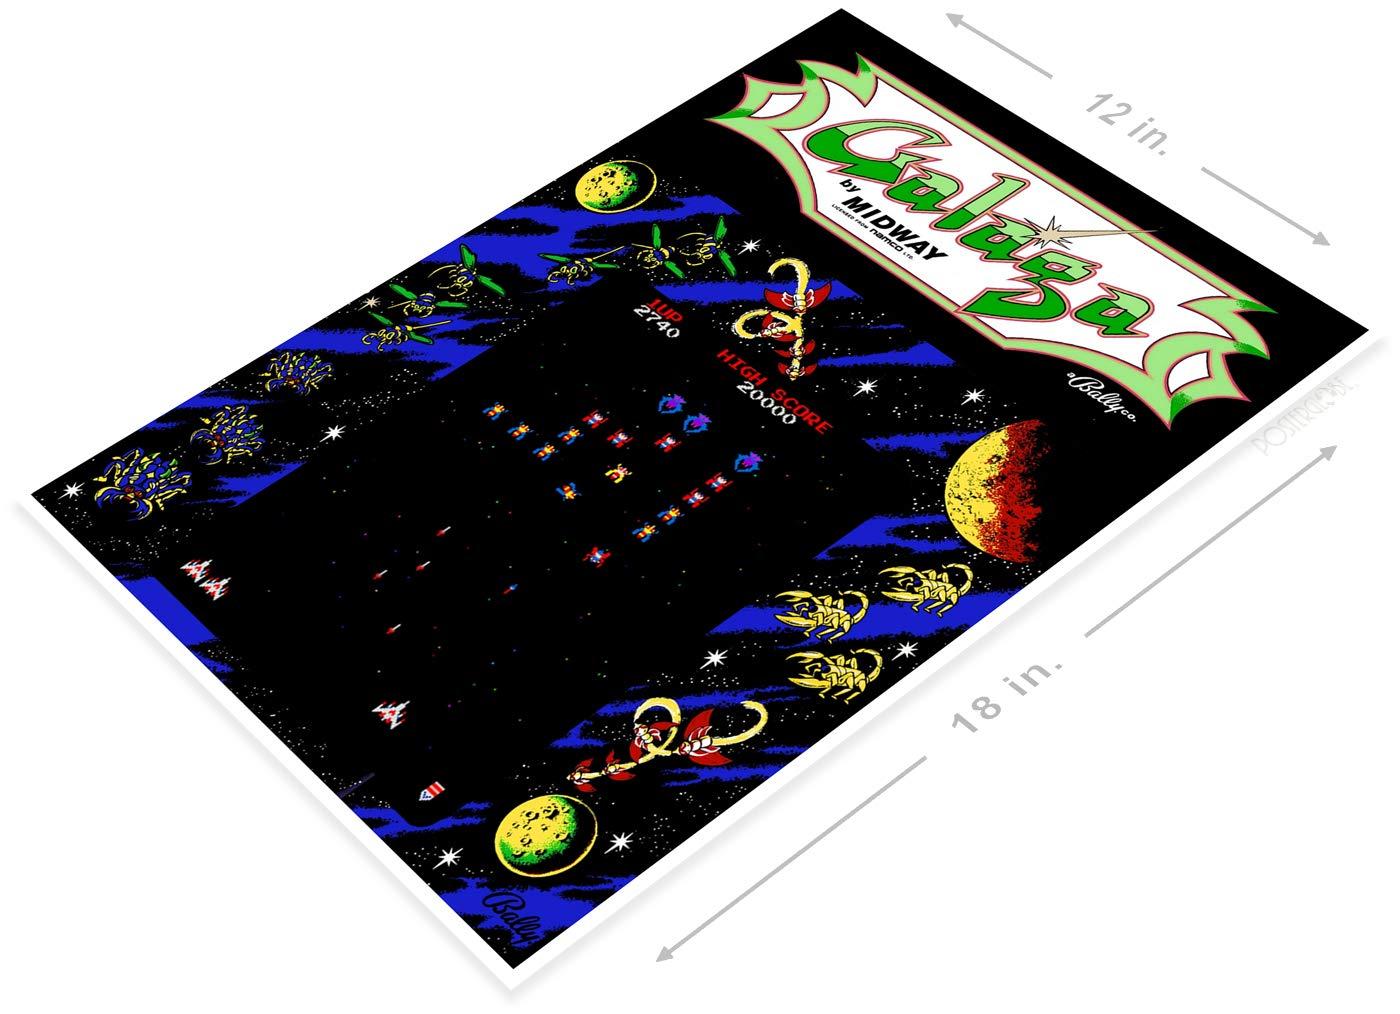 PosterGlobe Poster A400 Galaga Arcade Shop Game Room Marquee Sign Retro Console 12 x 18